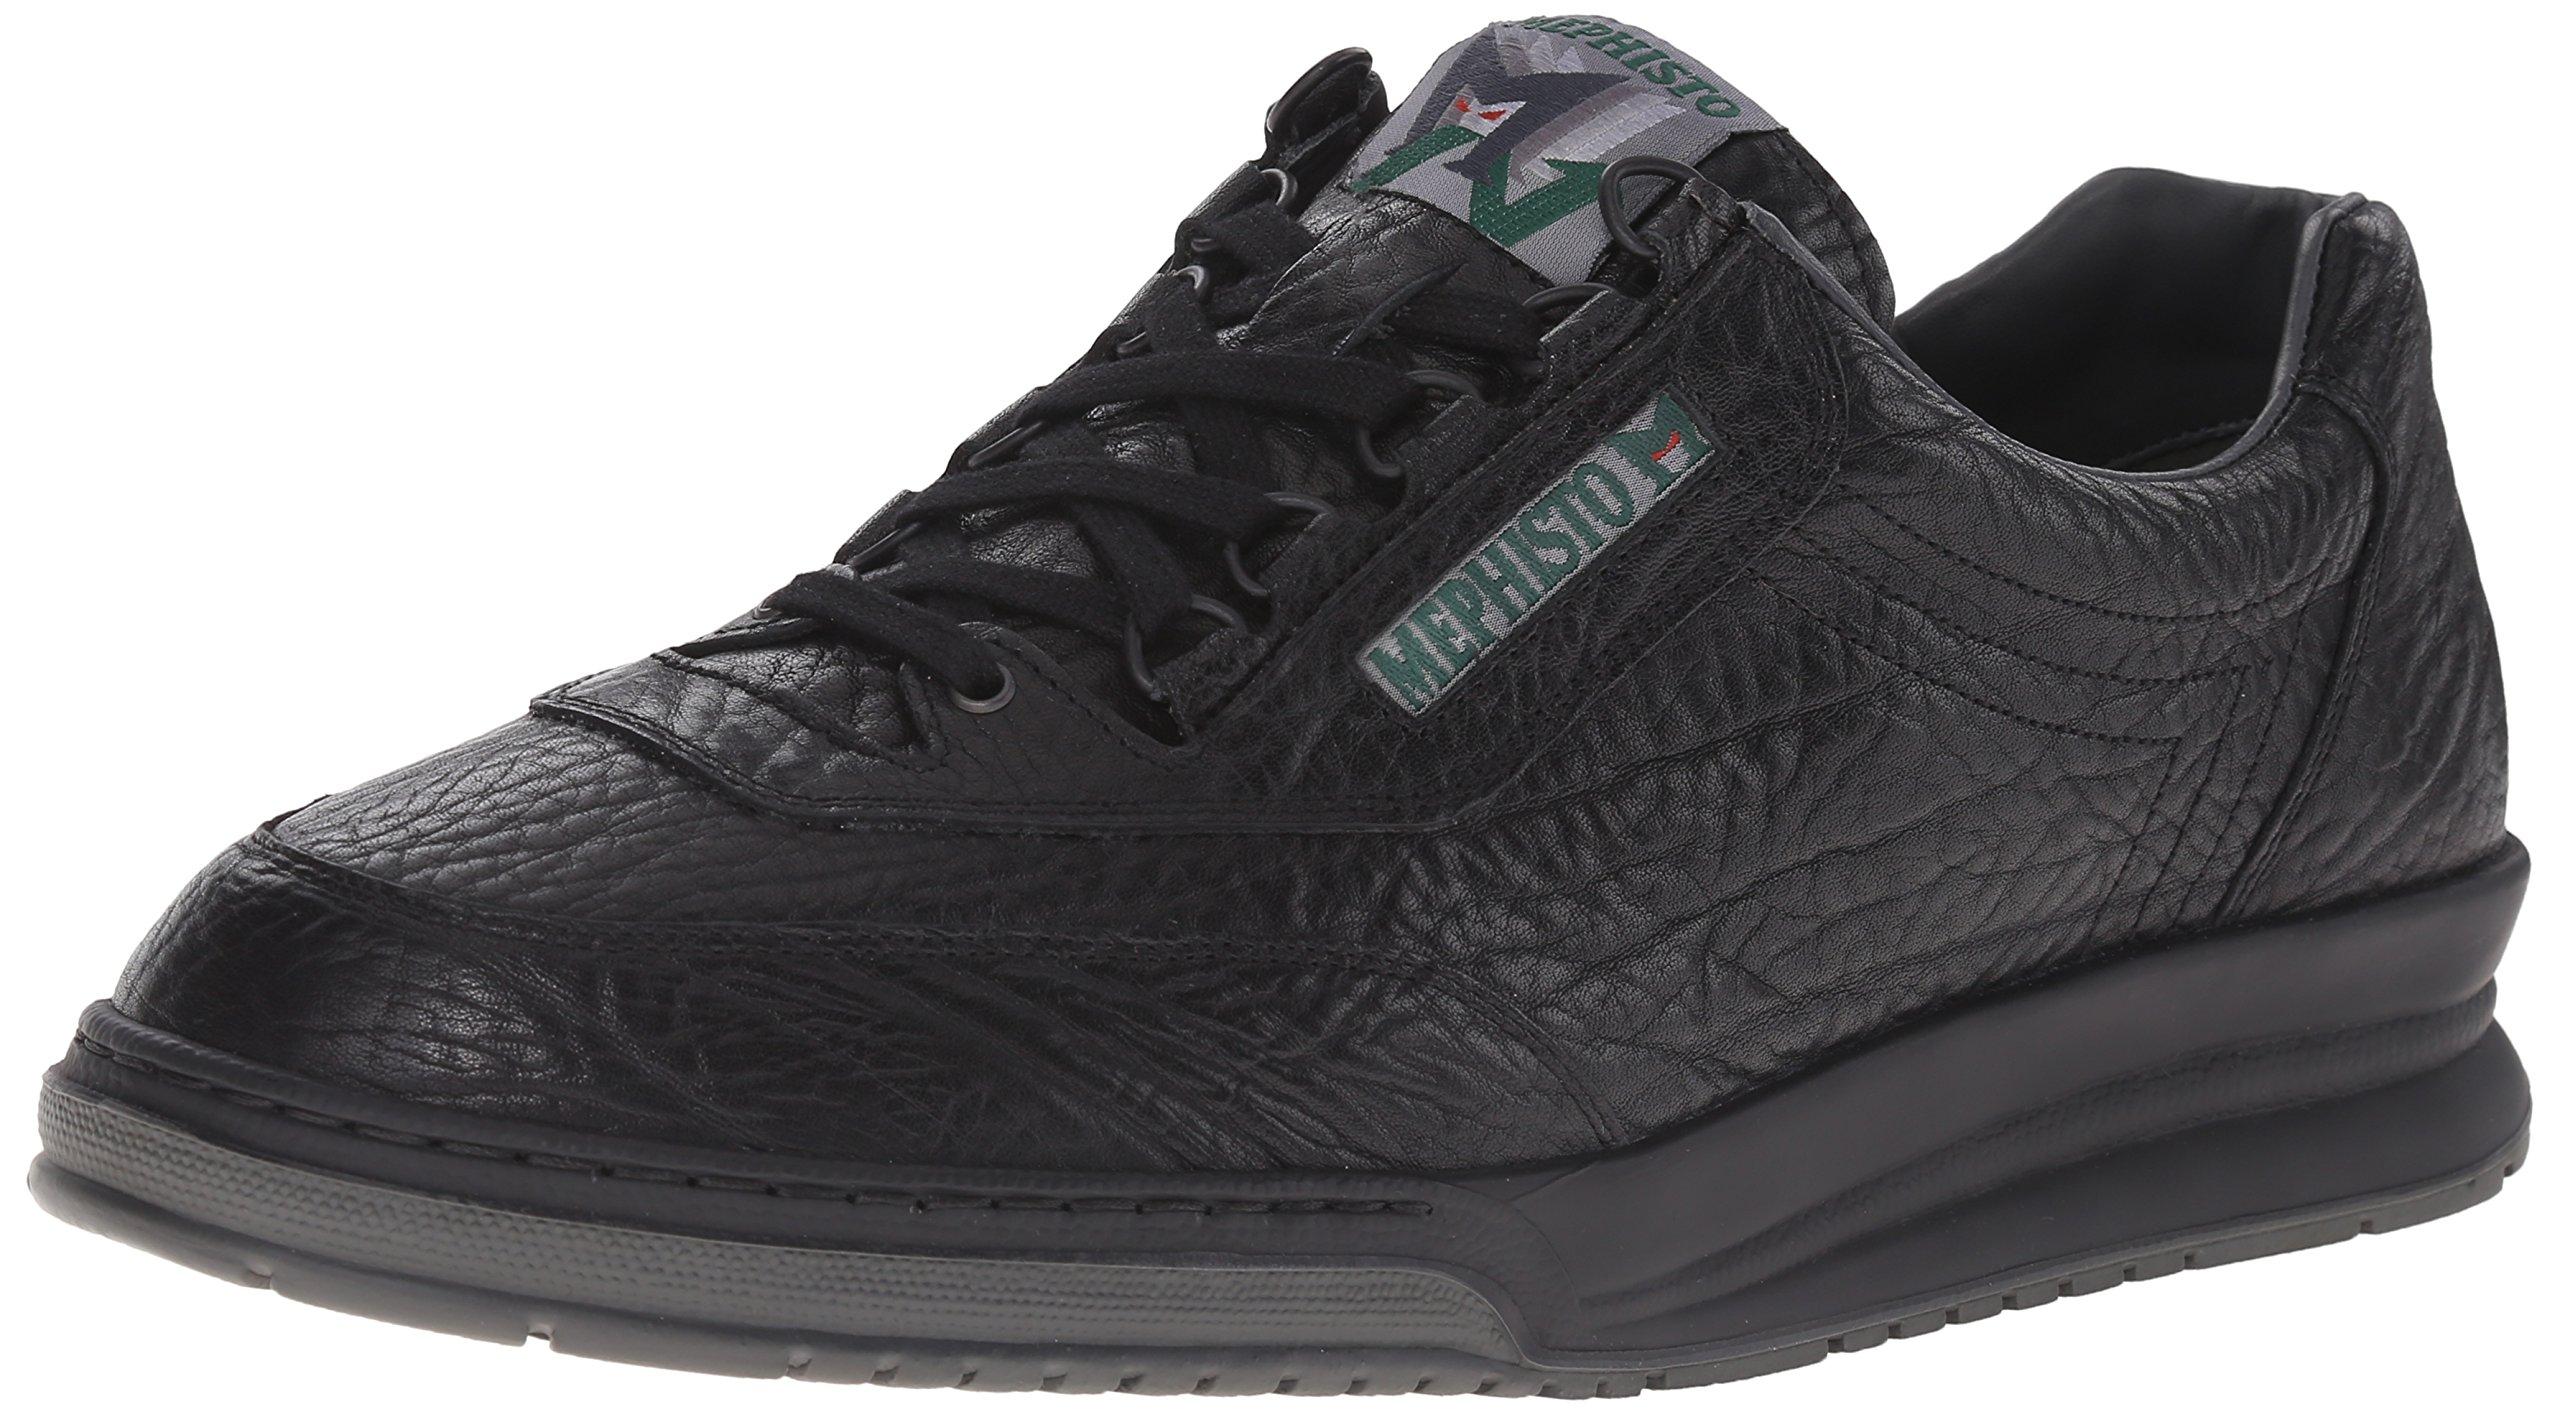 Mephisto Men's Match Walking Shoe,Black,8 M US